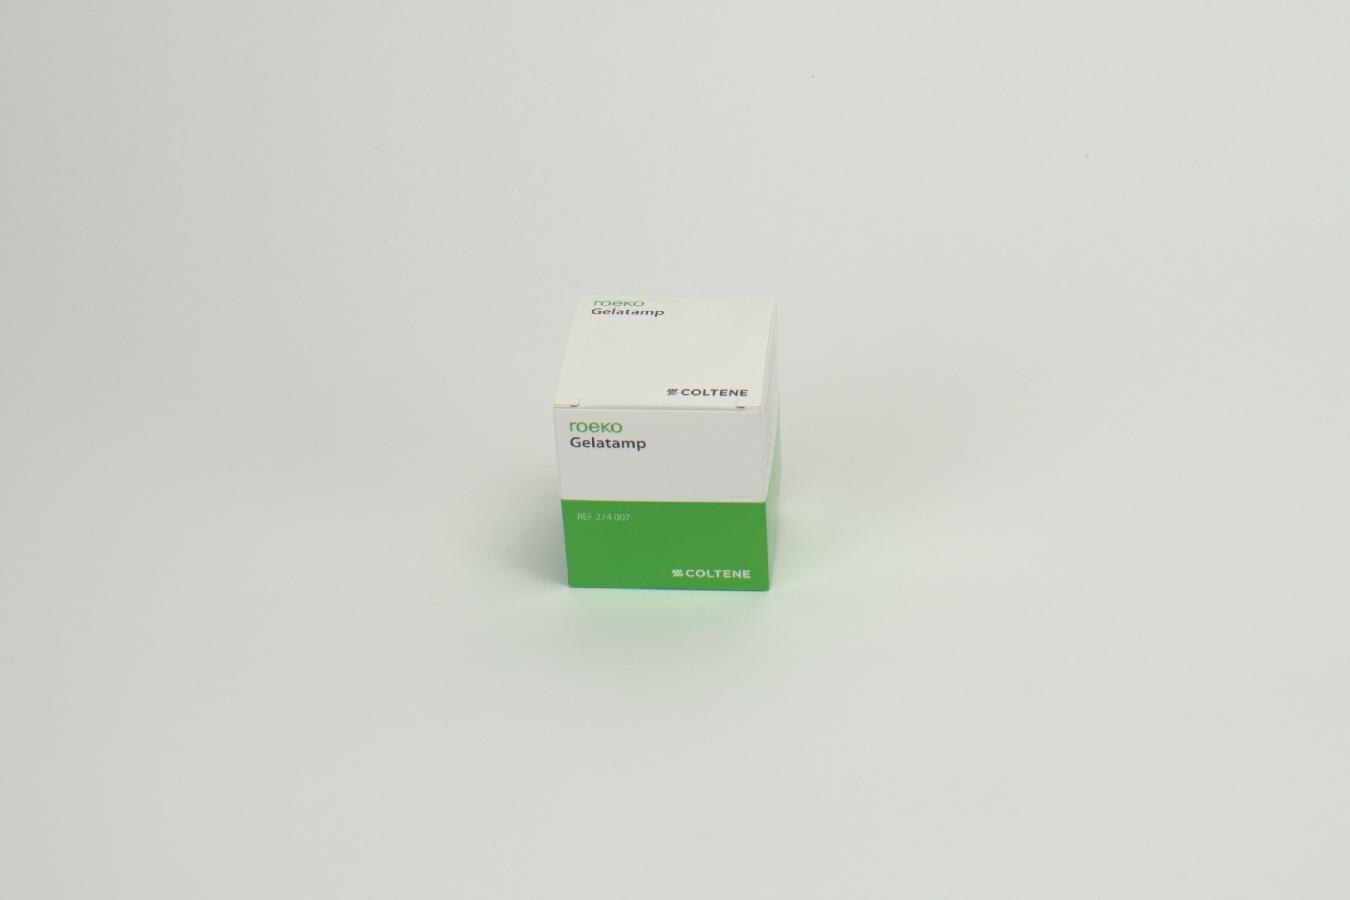 Gelatamp 14x7x7  50 St